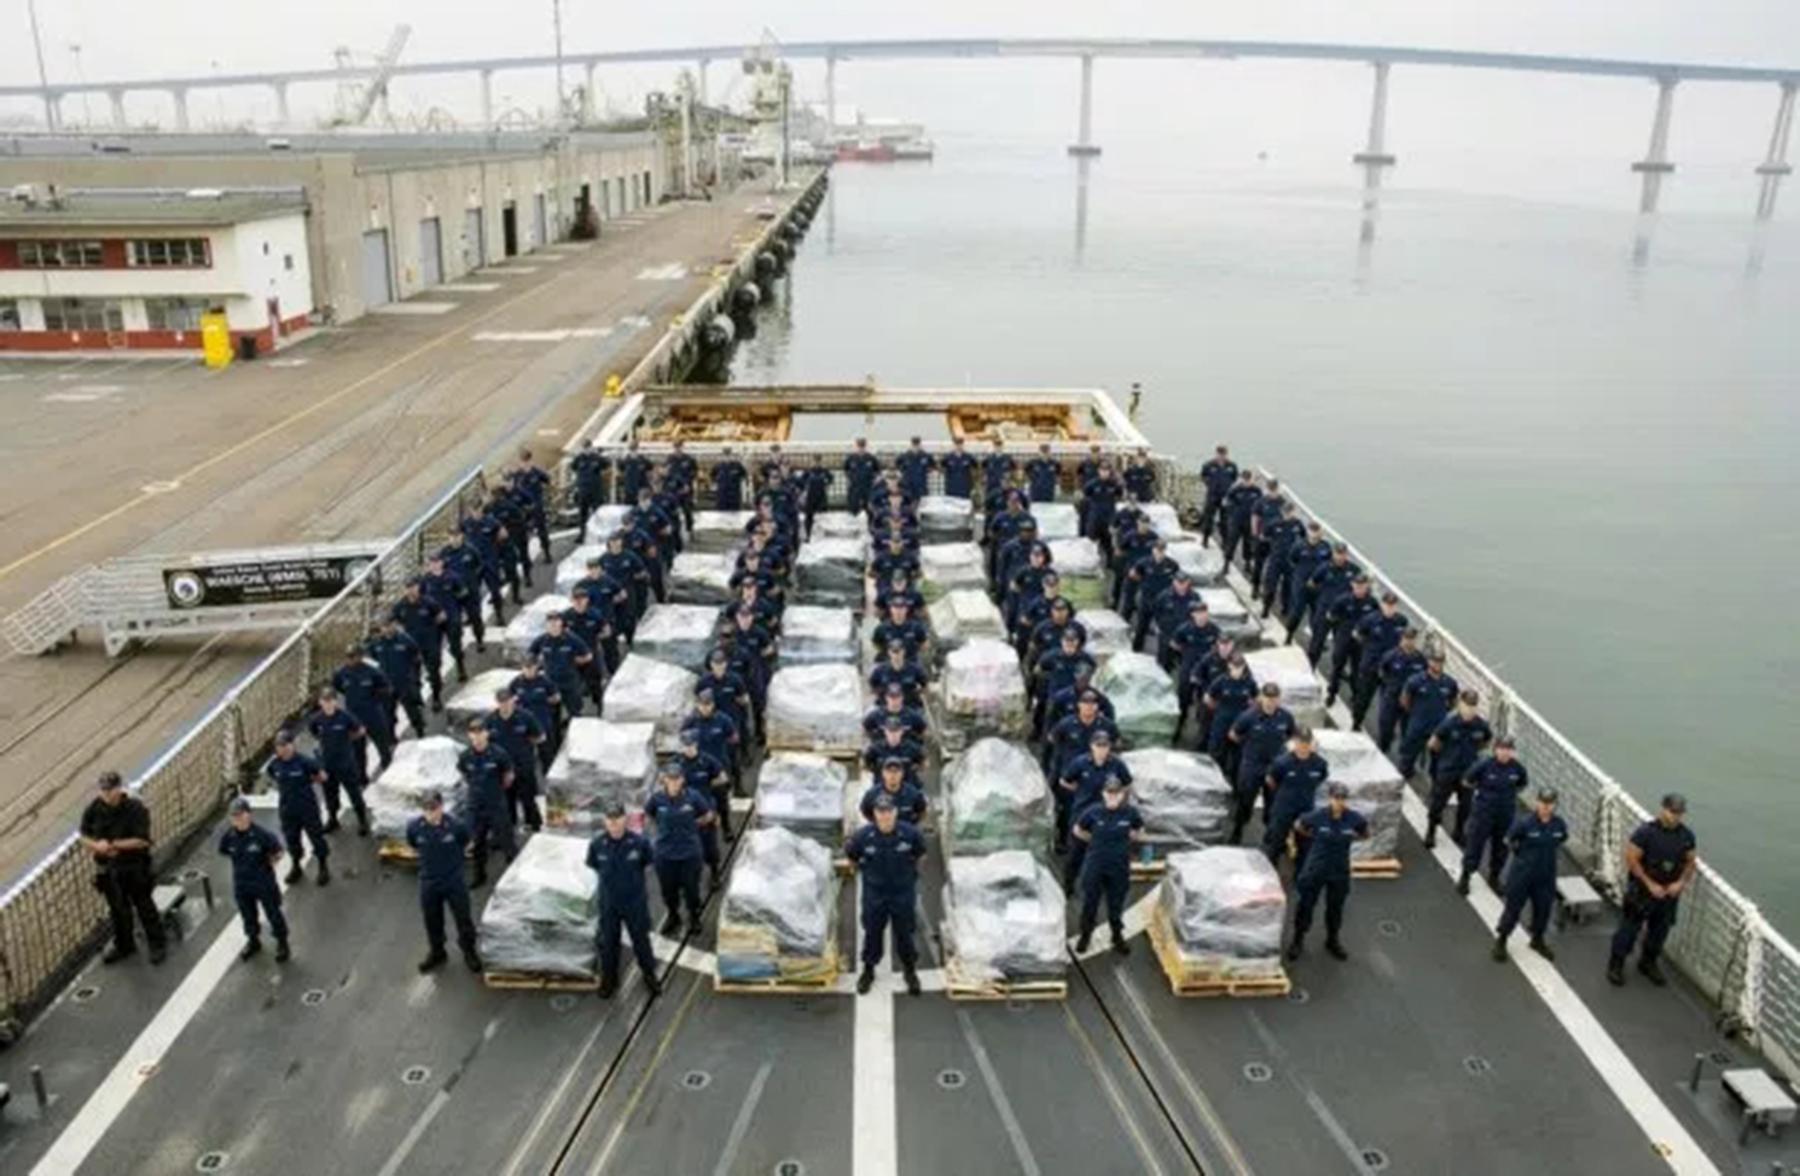 U.S. Coast Guard photo by Petty Officer 3rd Class Davonte Marrow